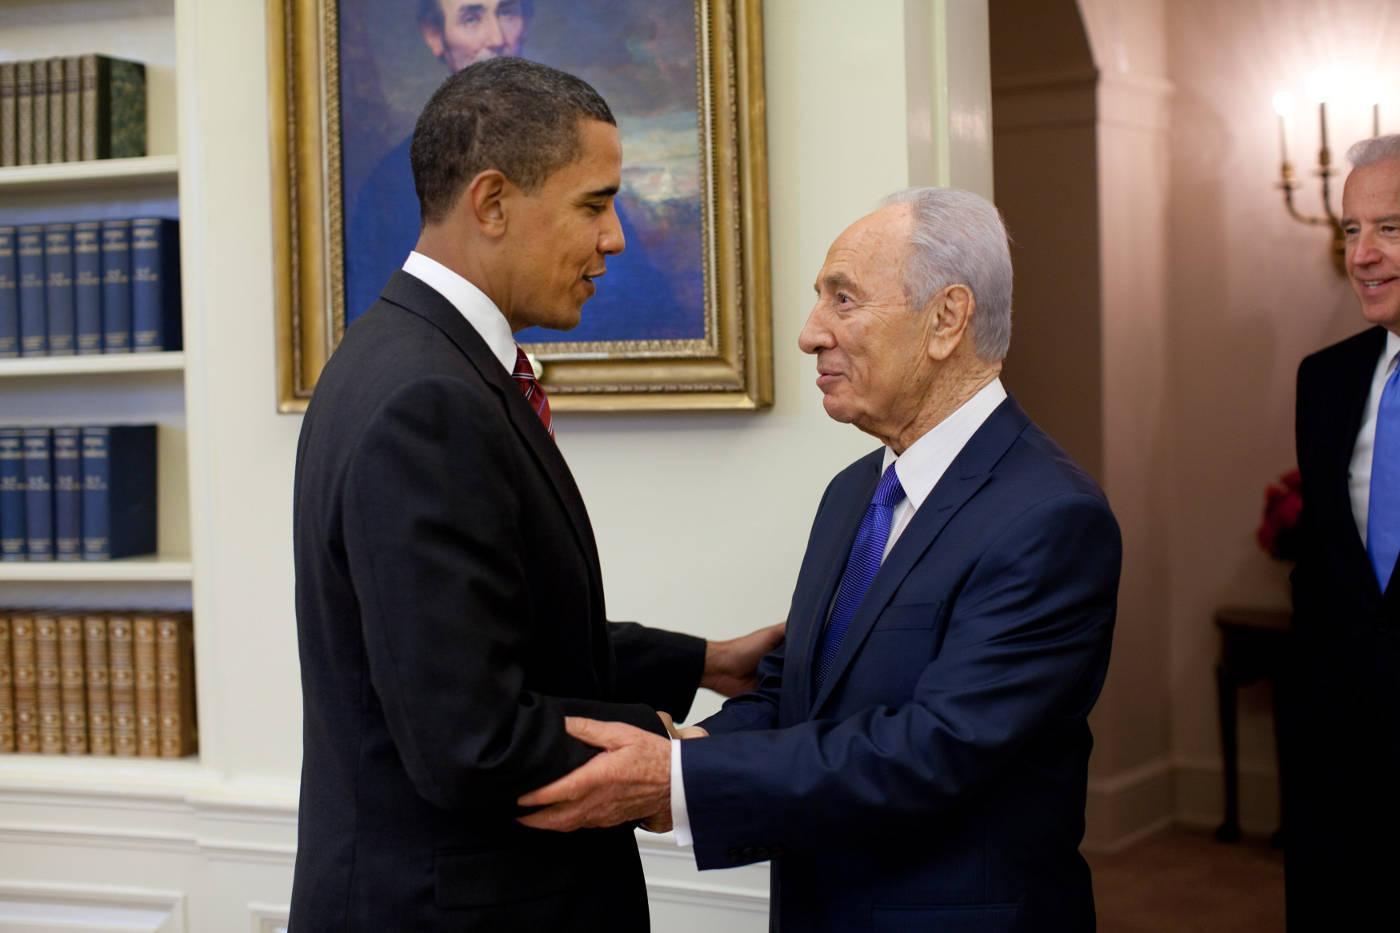 Barack Obama podáva ruku izraelskému prezidentovi Shimon Peresovi